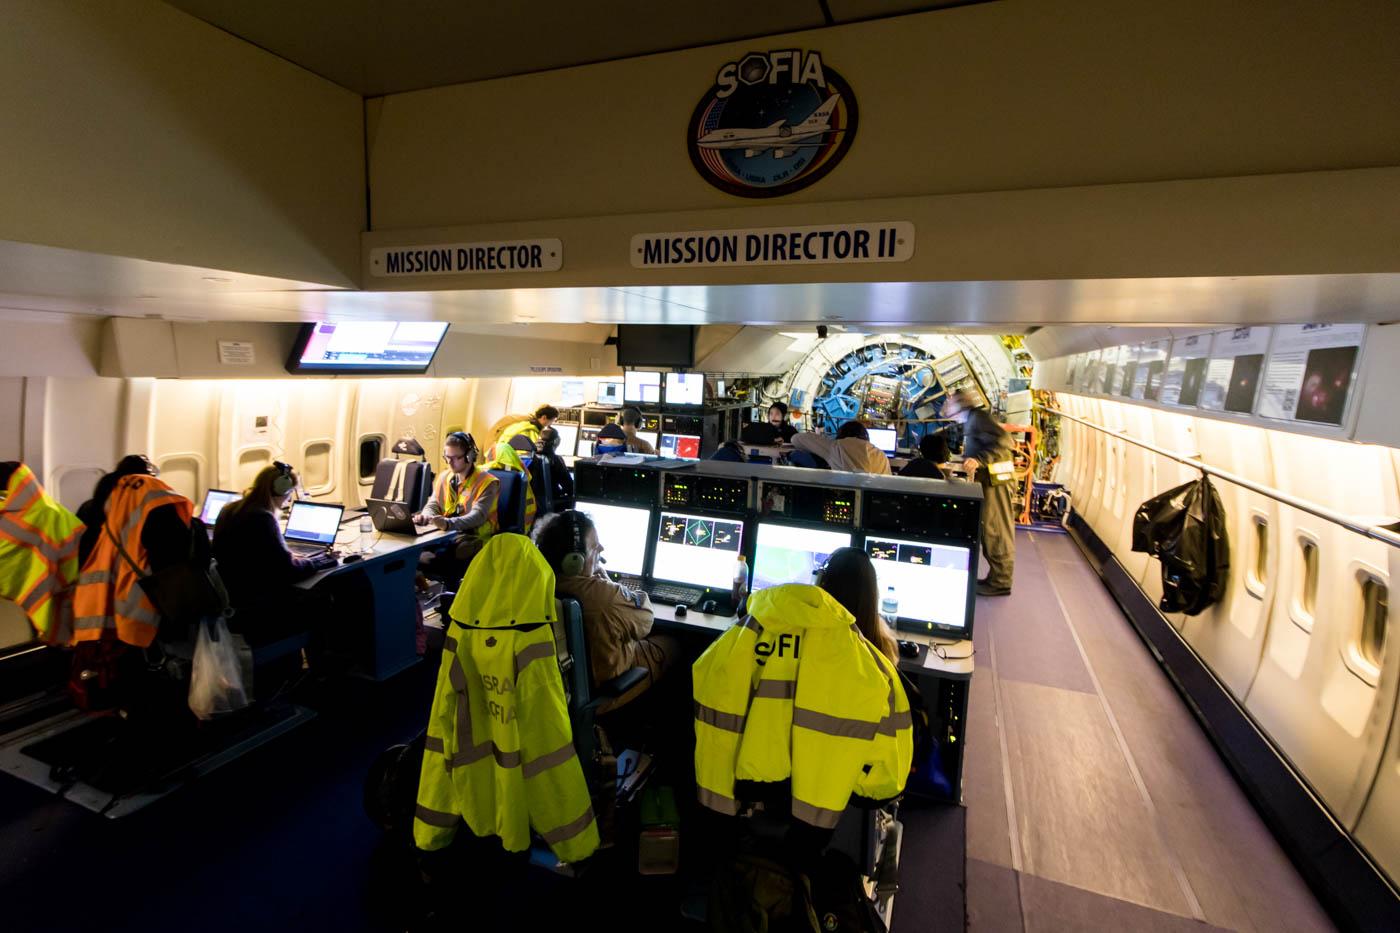 NASA SOFIA Mission Directors